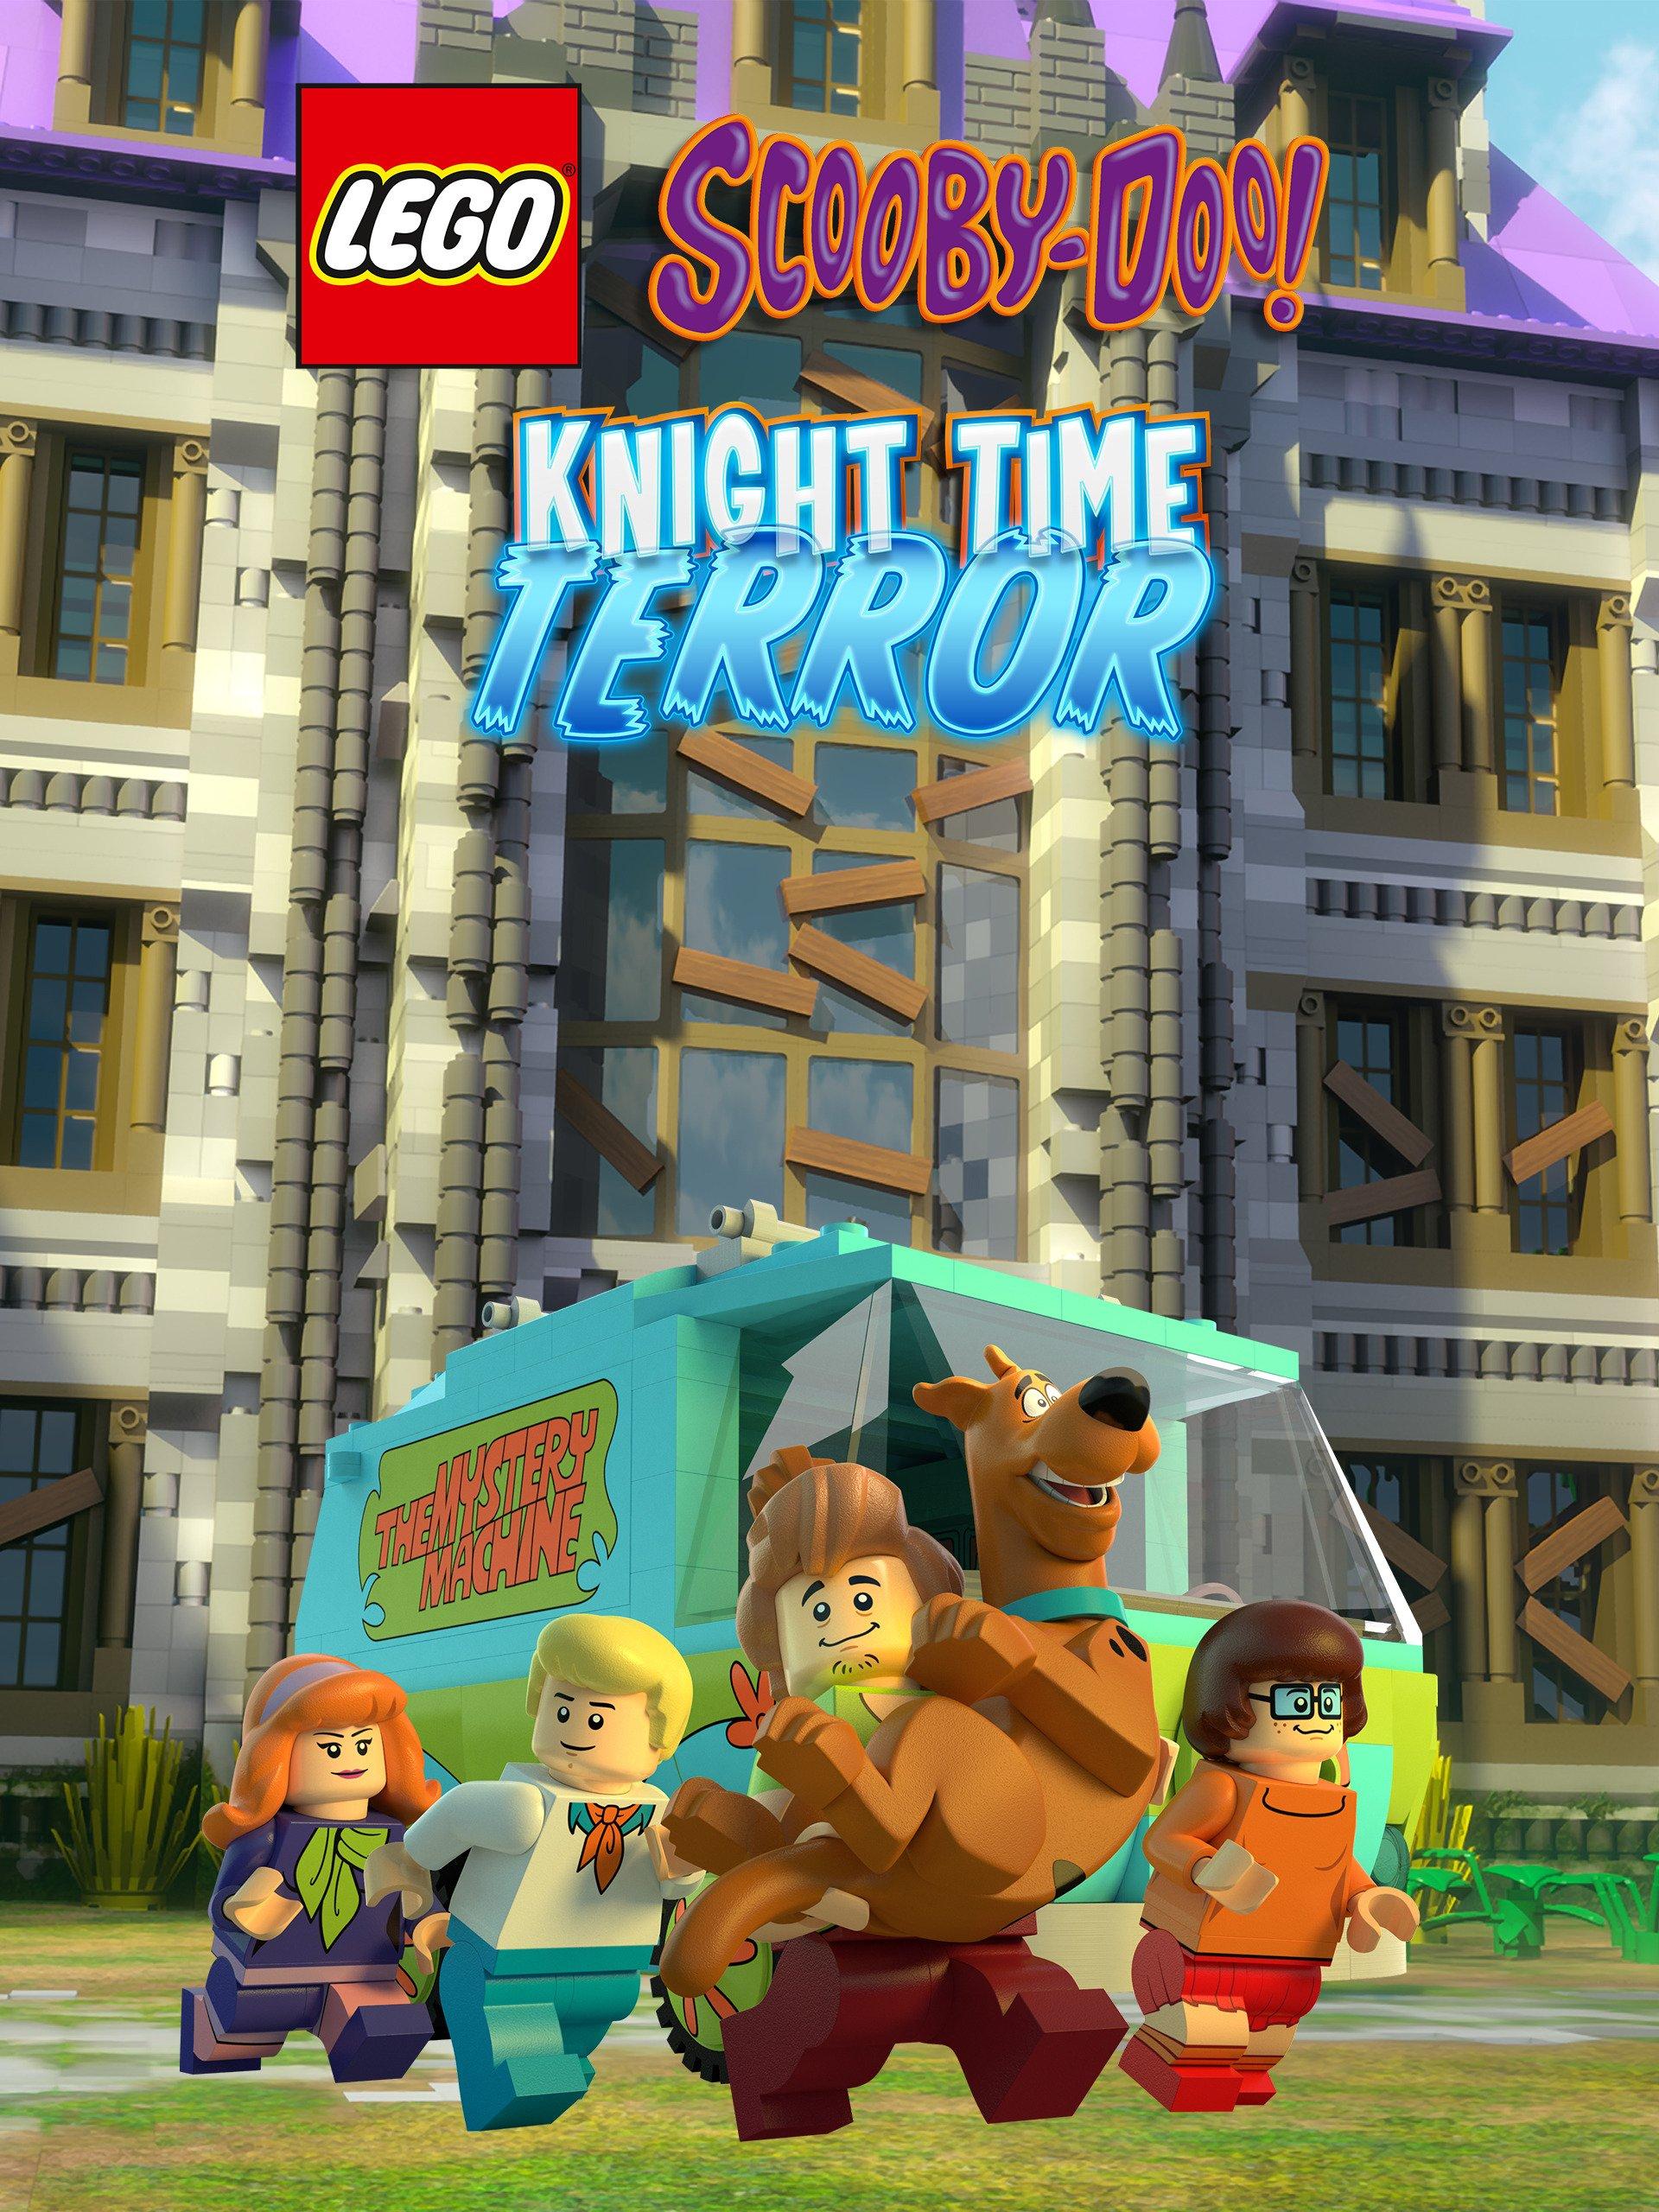 Amazon com: Watch LEGO Scooby Doo: Knight Time Terror